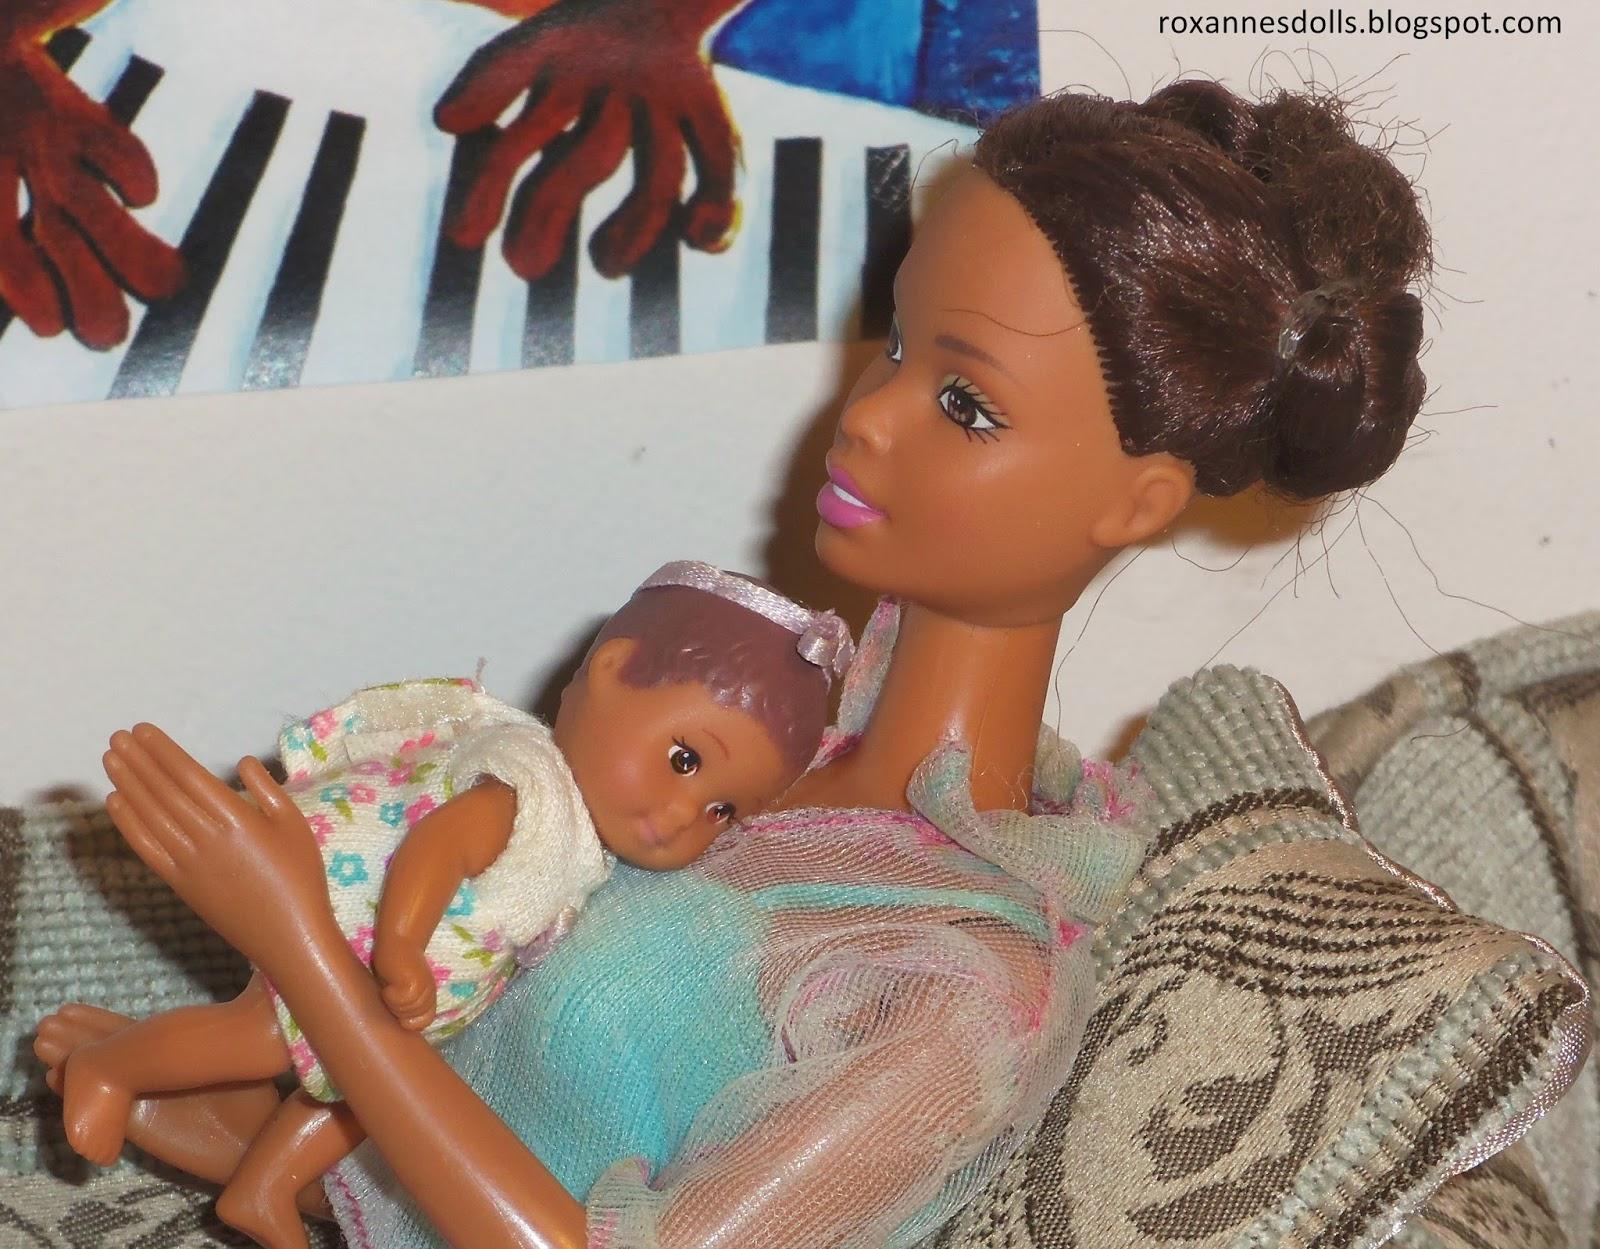 Roxanne S Dolls Walking Barbie And Baby Krissy